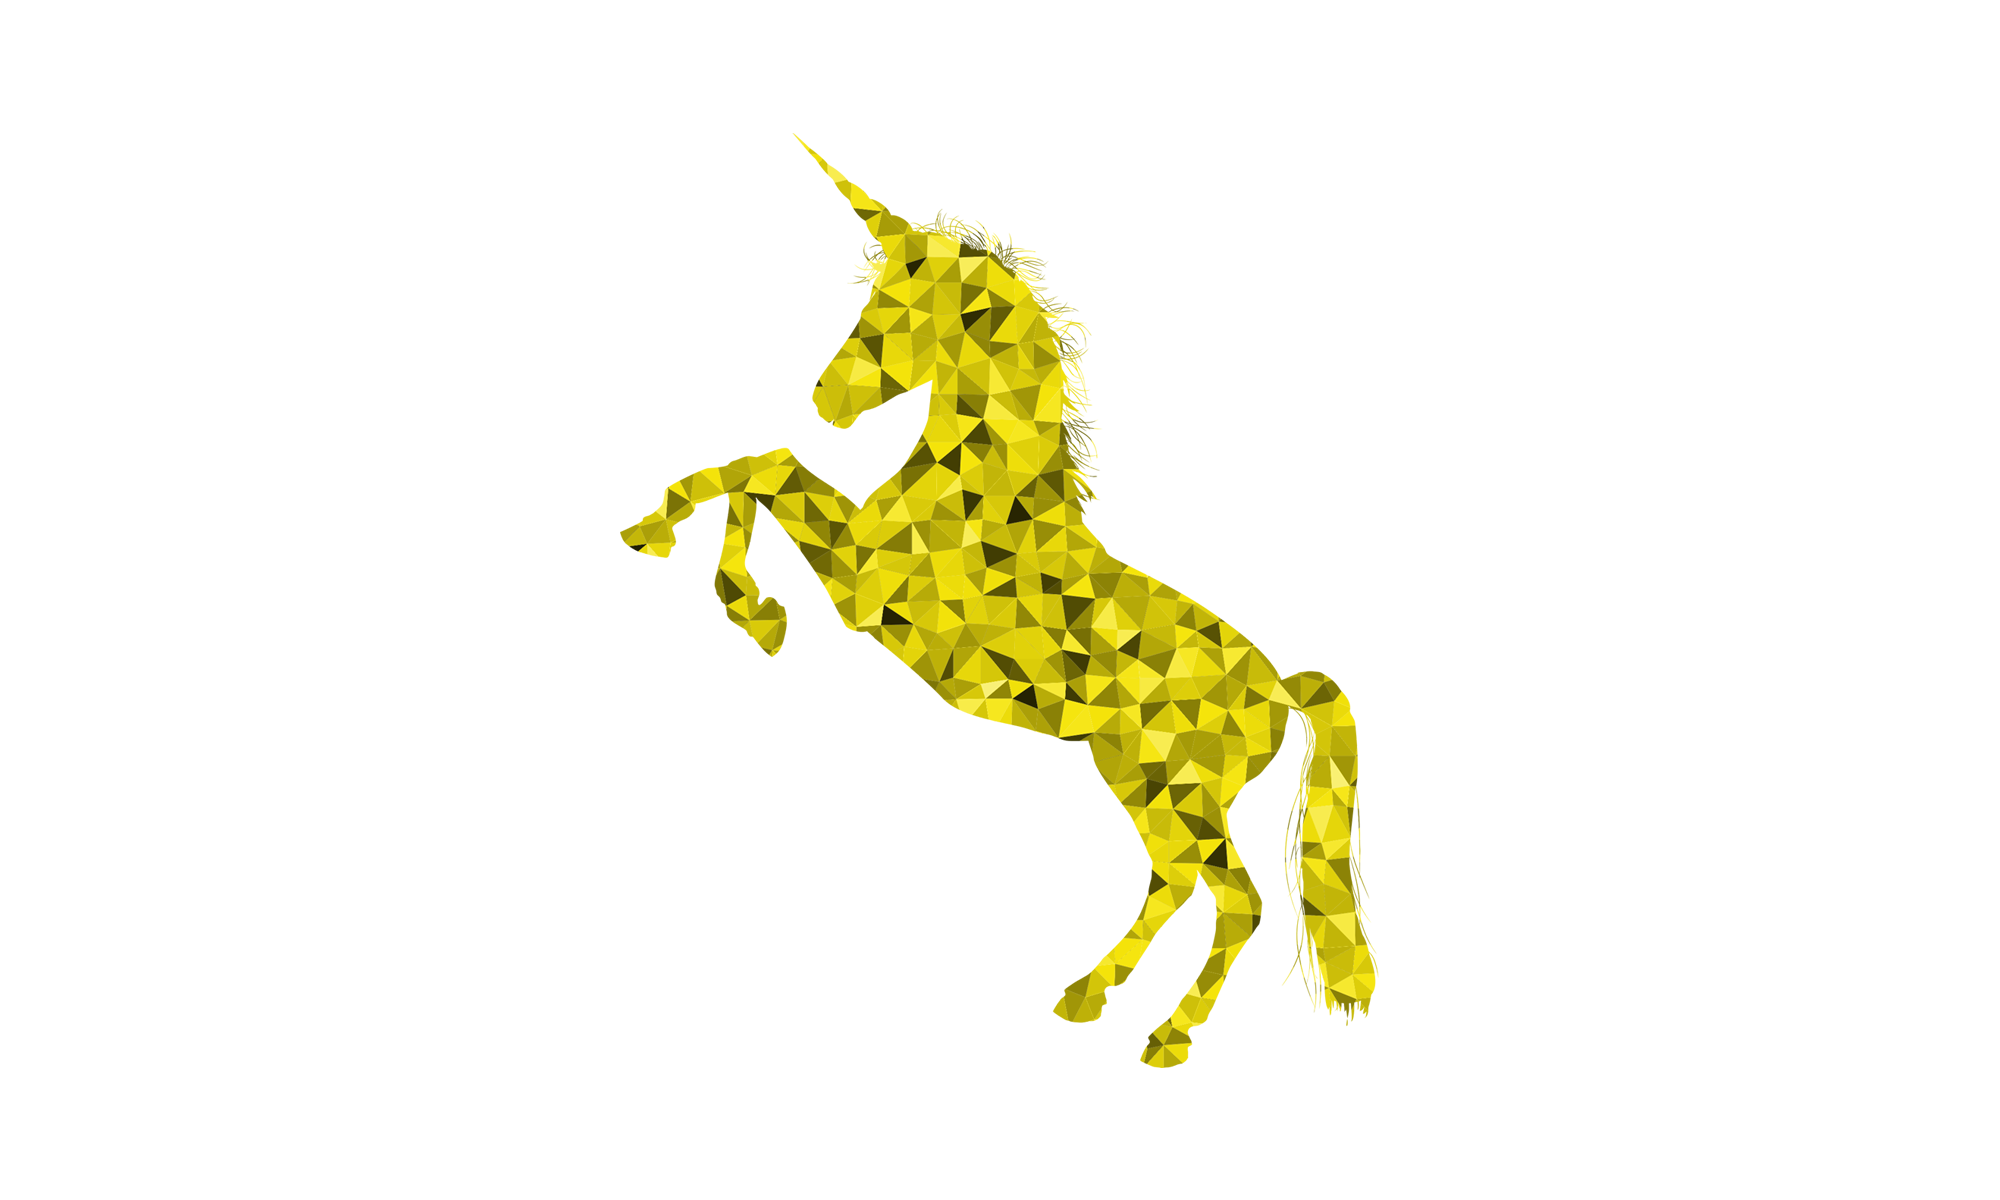 UnicornCorn